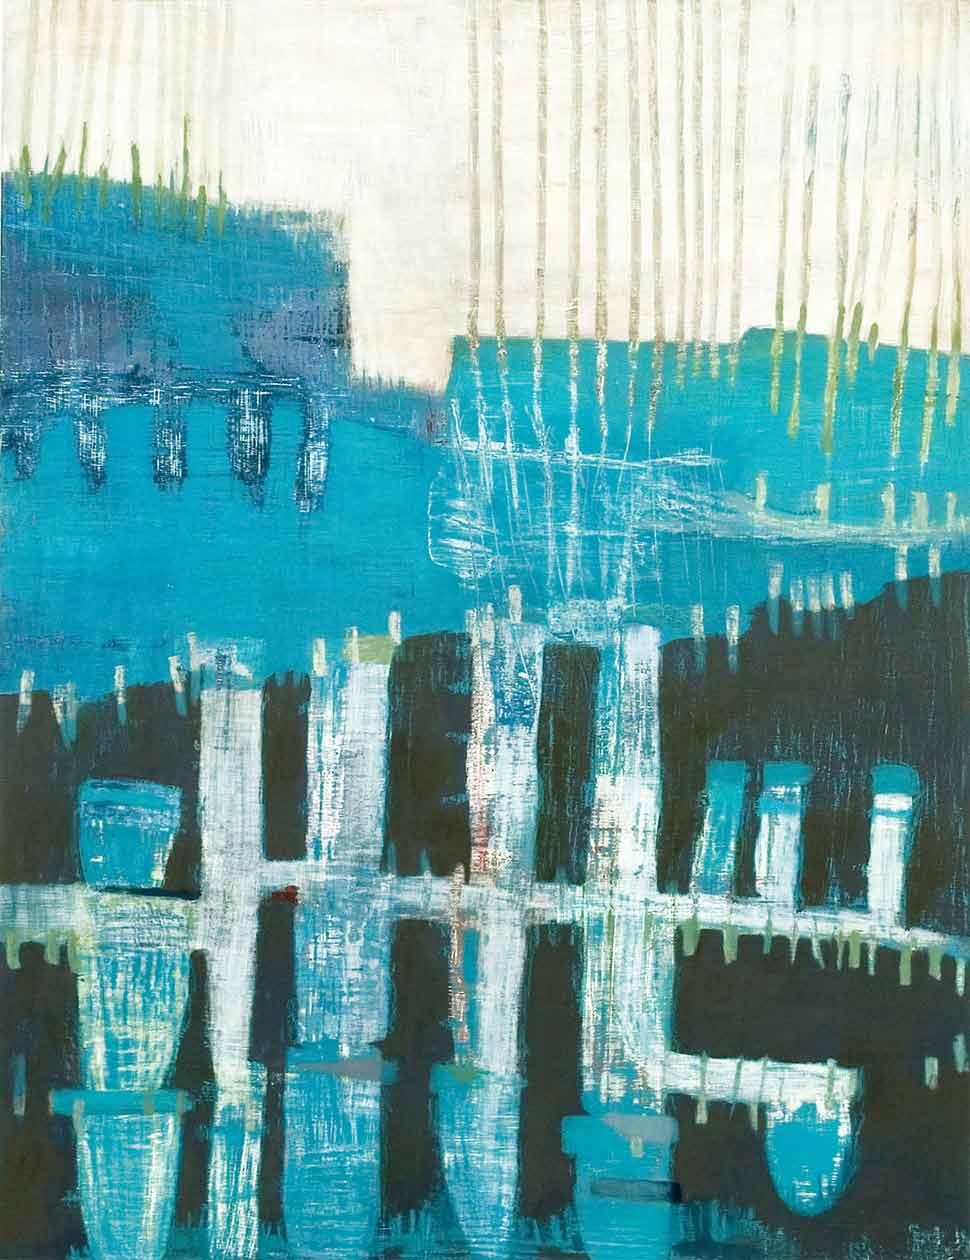 Eugenie Davis - Fabricating Frontiers